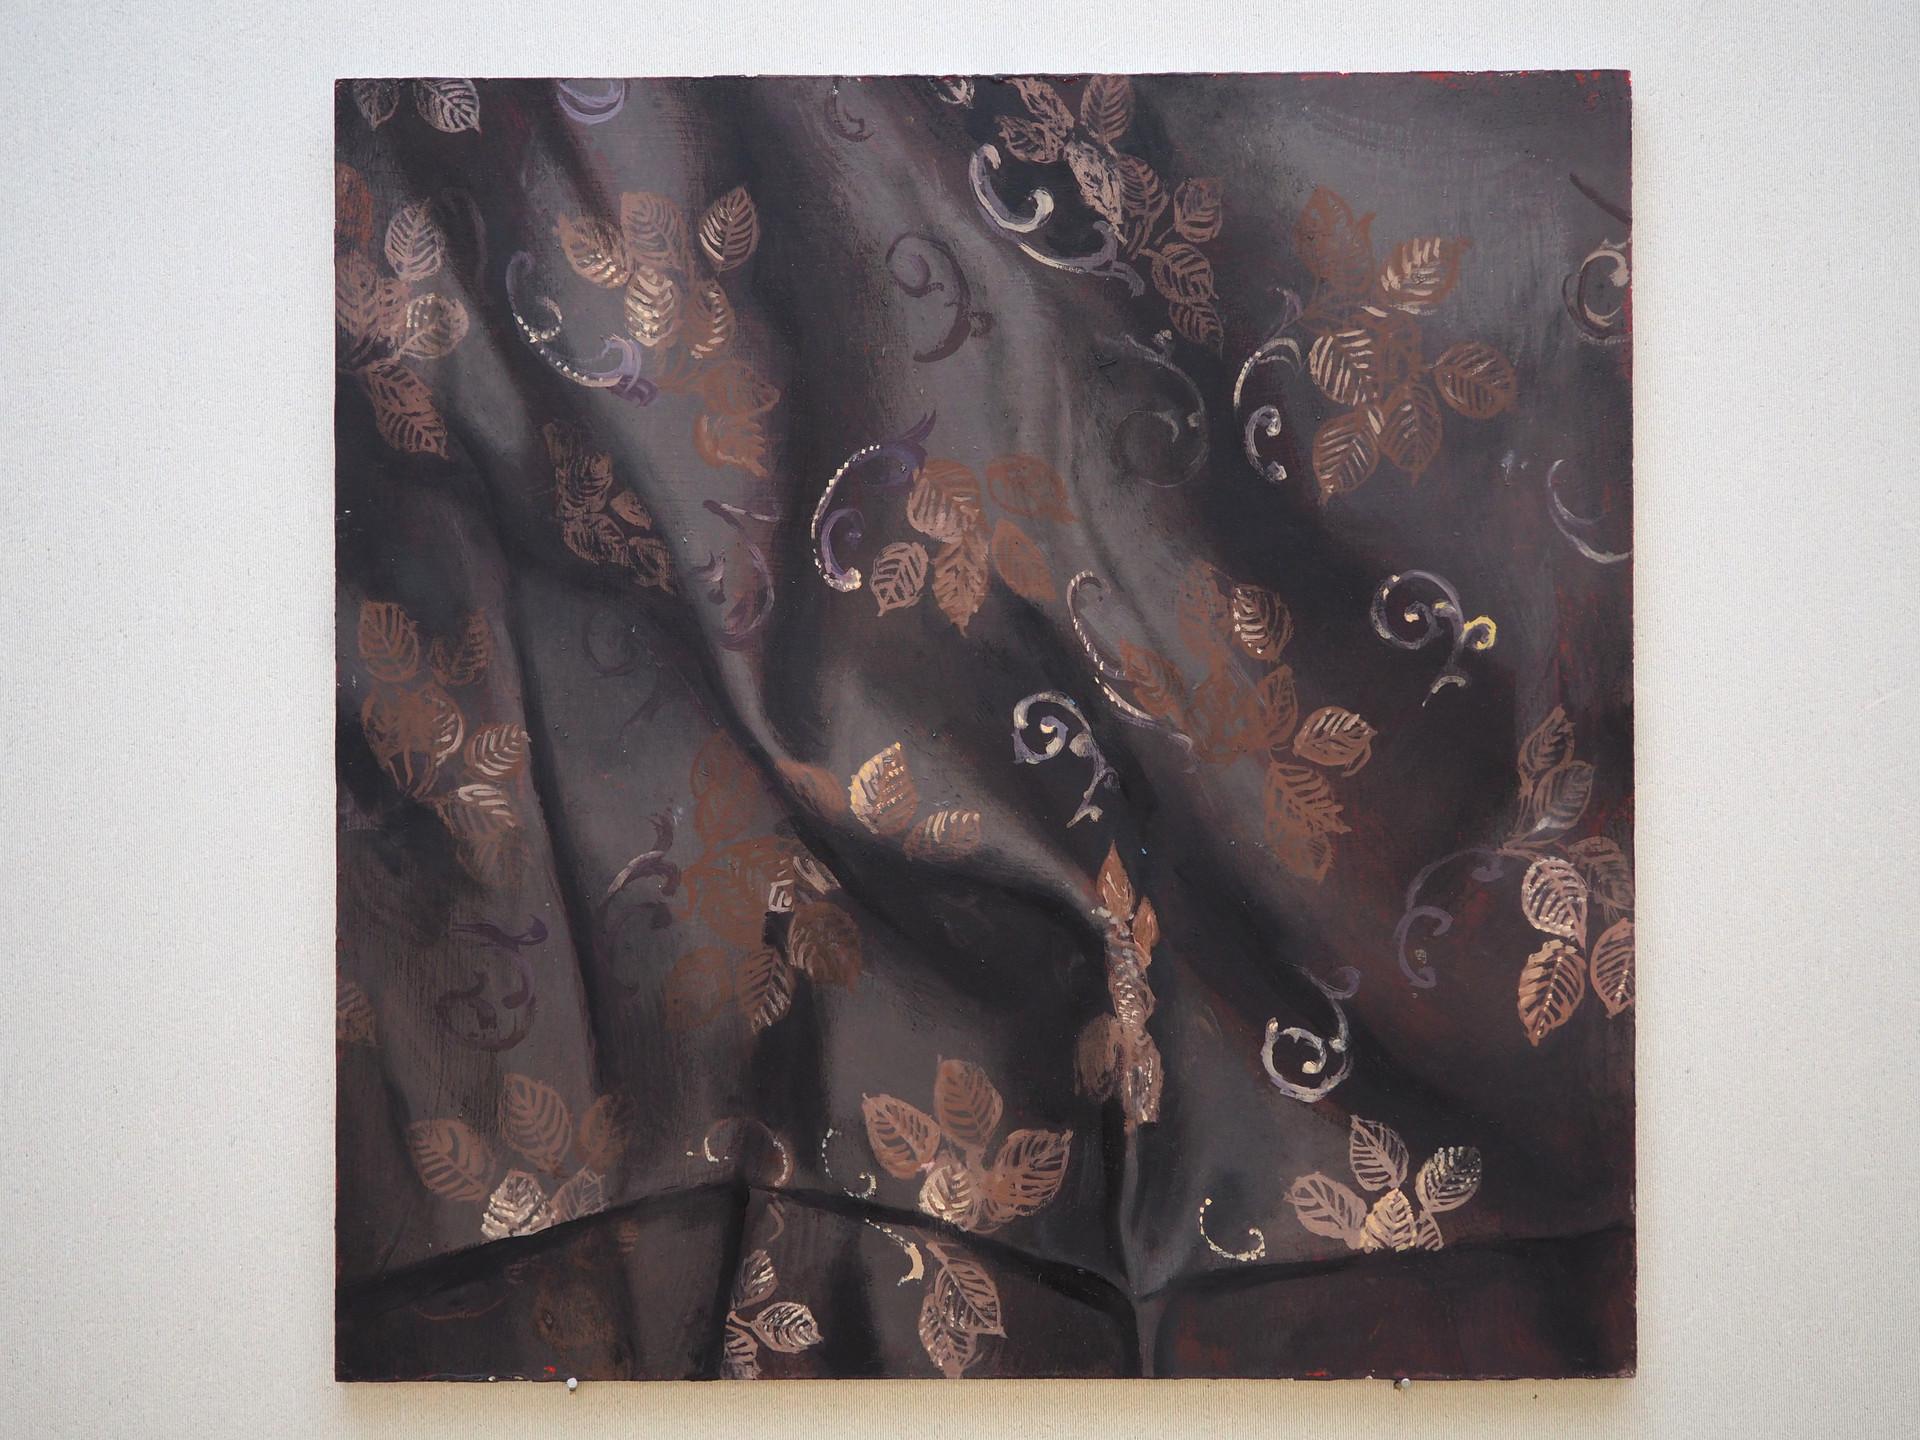 Drapery study, Fig. 3.,Oil on MDF, 40 x 40 cm, 2019